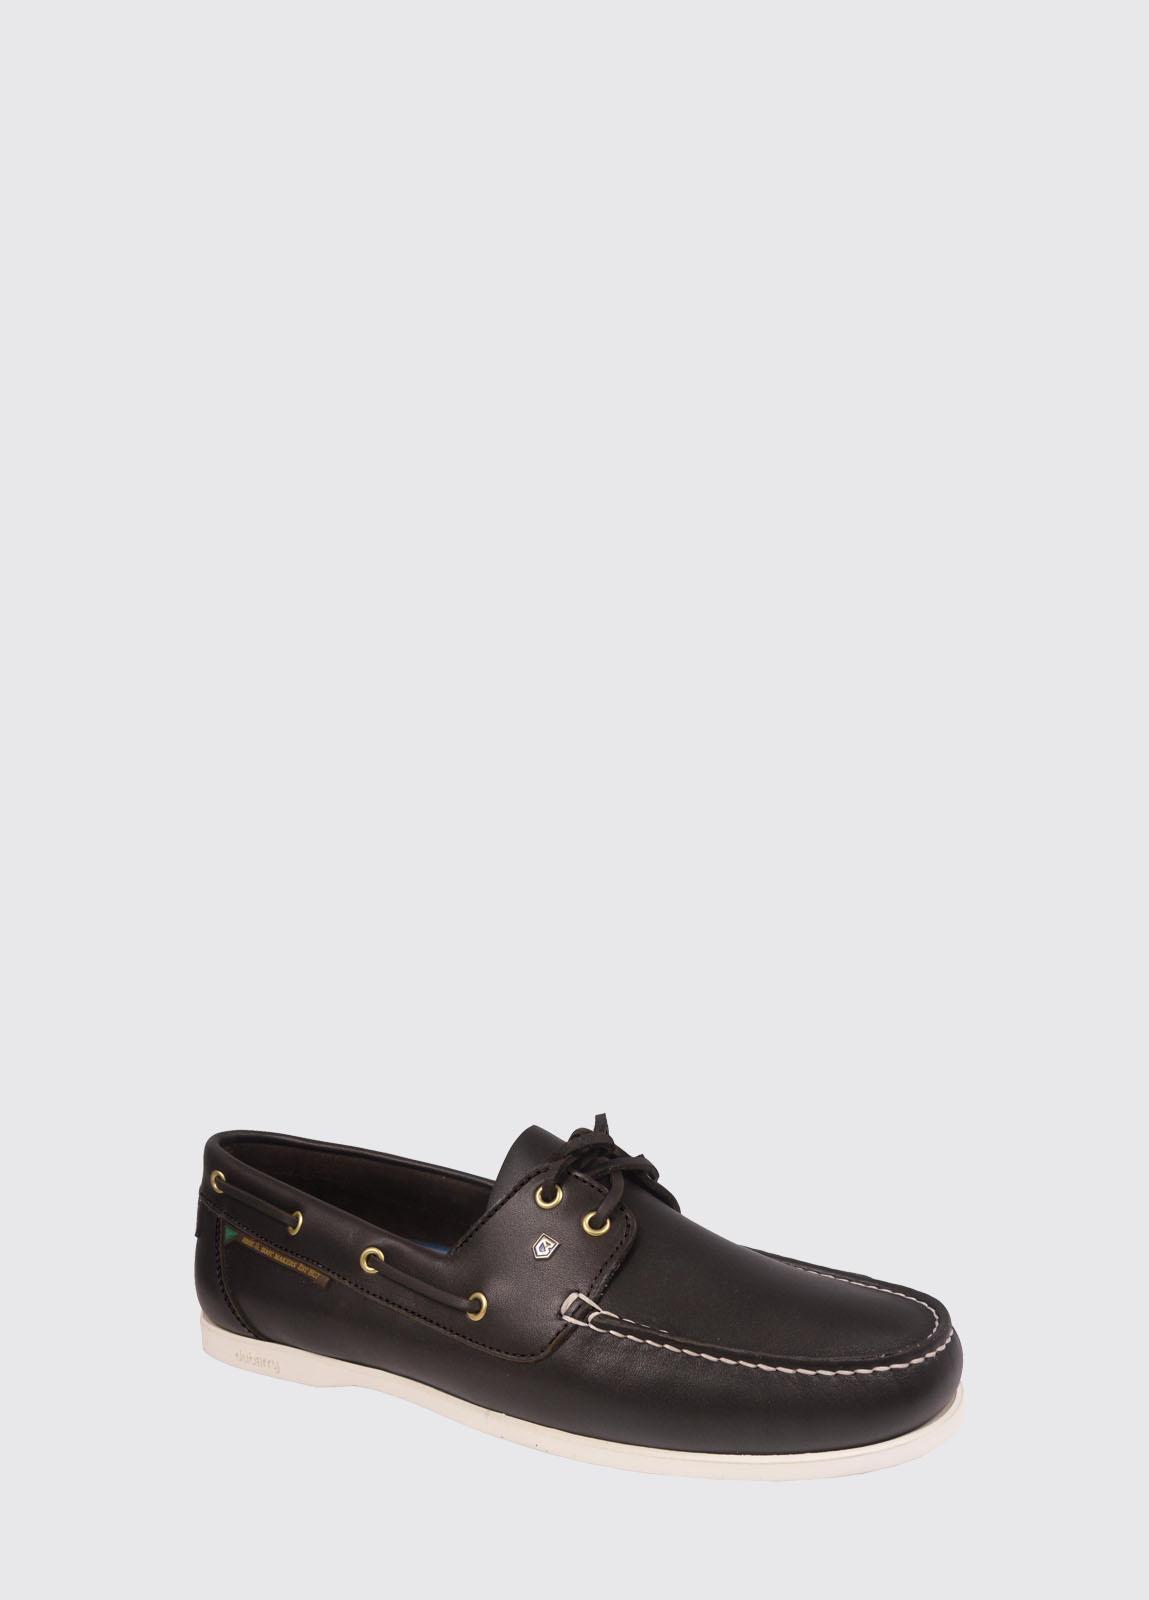 Windward Mens Deck Shoe - Java